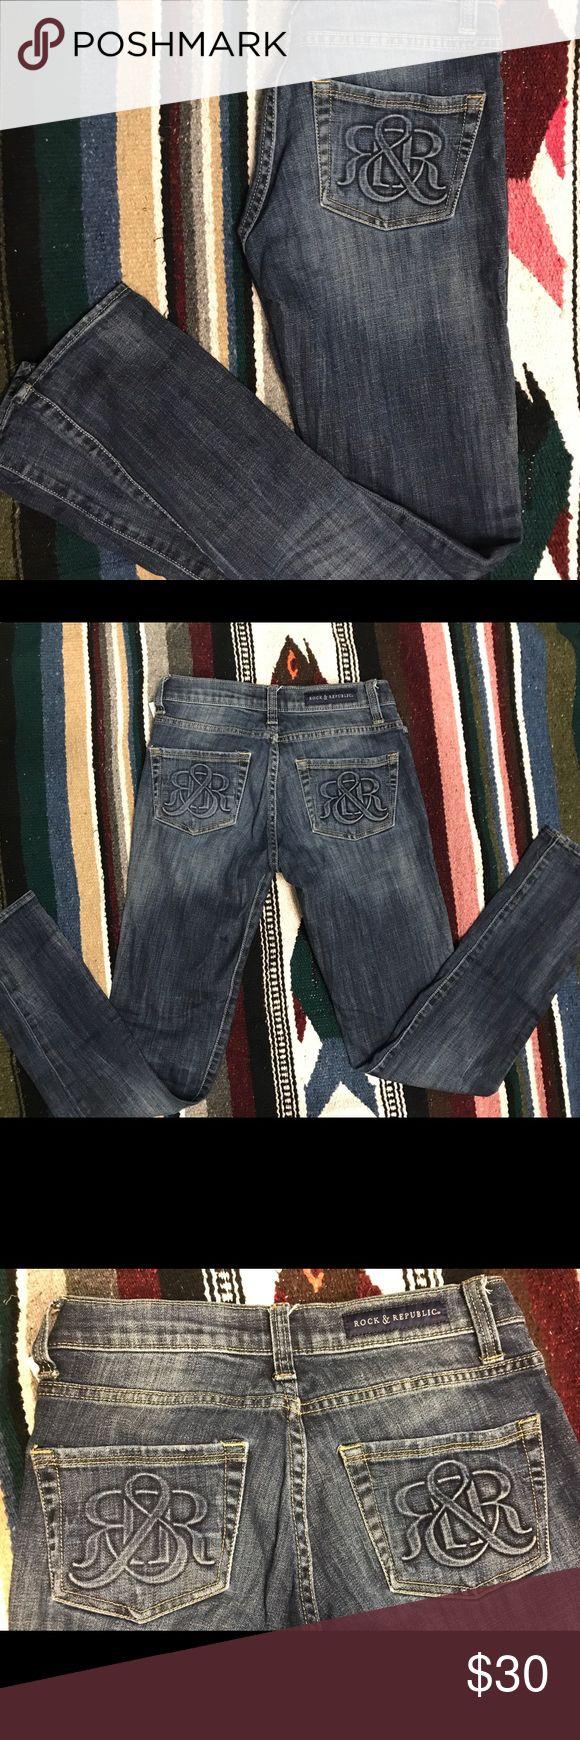 Rock & Republic Jeans dark straight skinny jeans Very cute straight leg skinny Rock and Republic Jeans dark wash almost brand new! Hardly worn! Rock & Republic Jeans Straight Leg